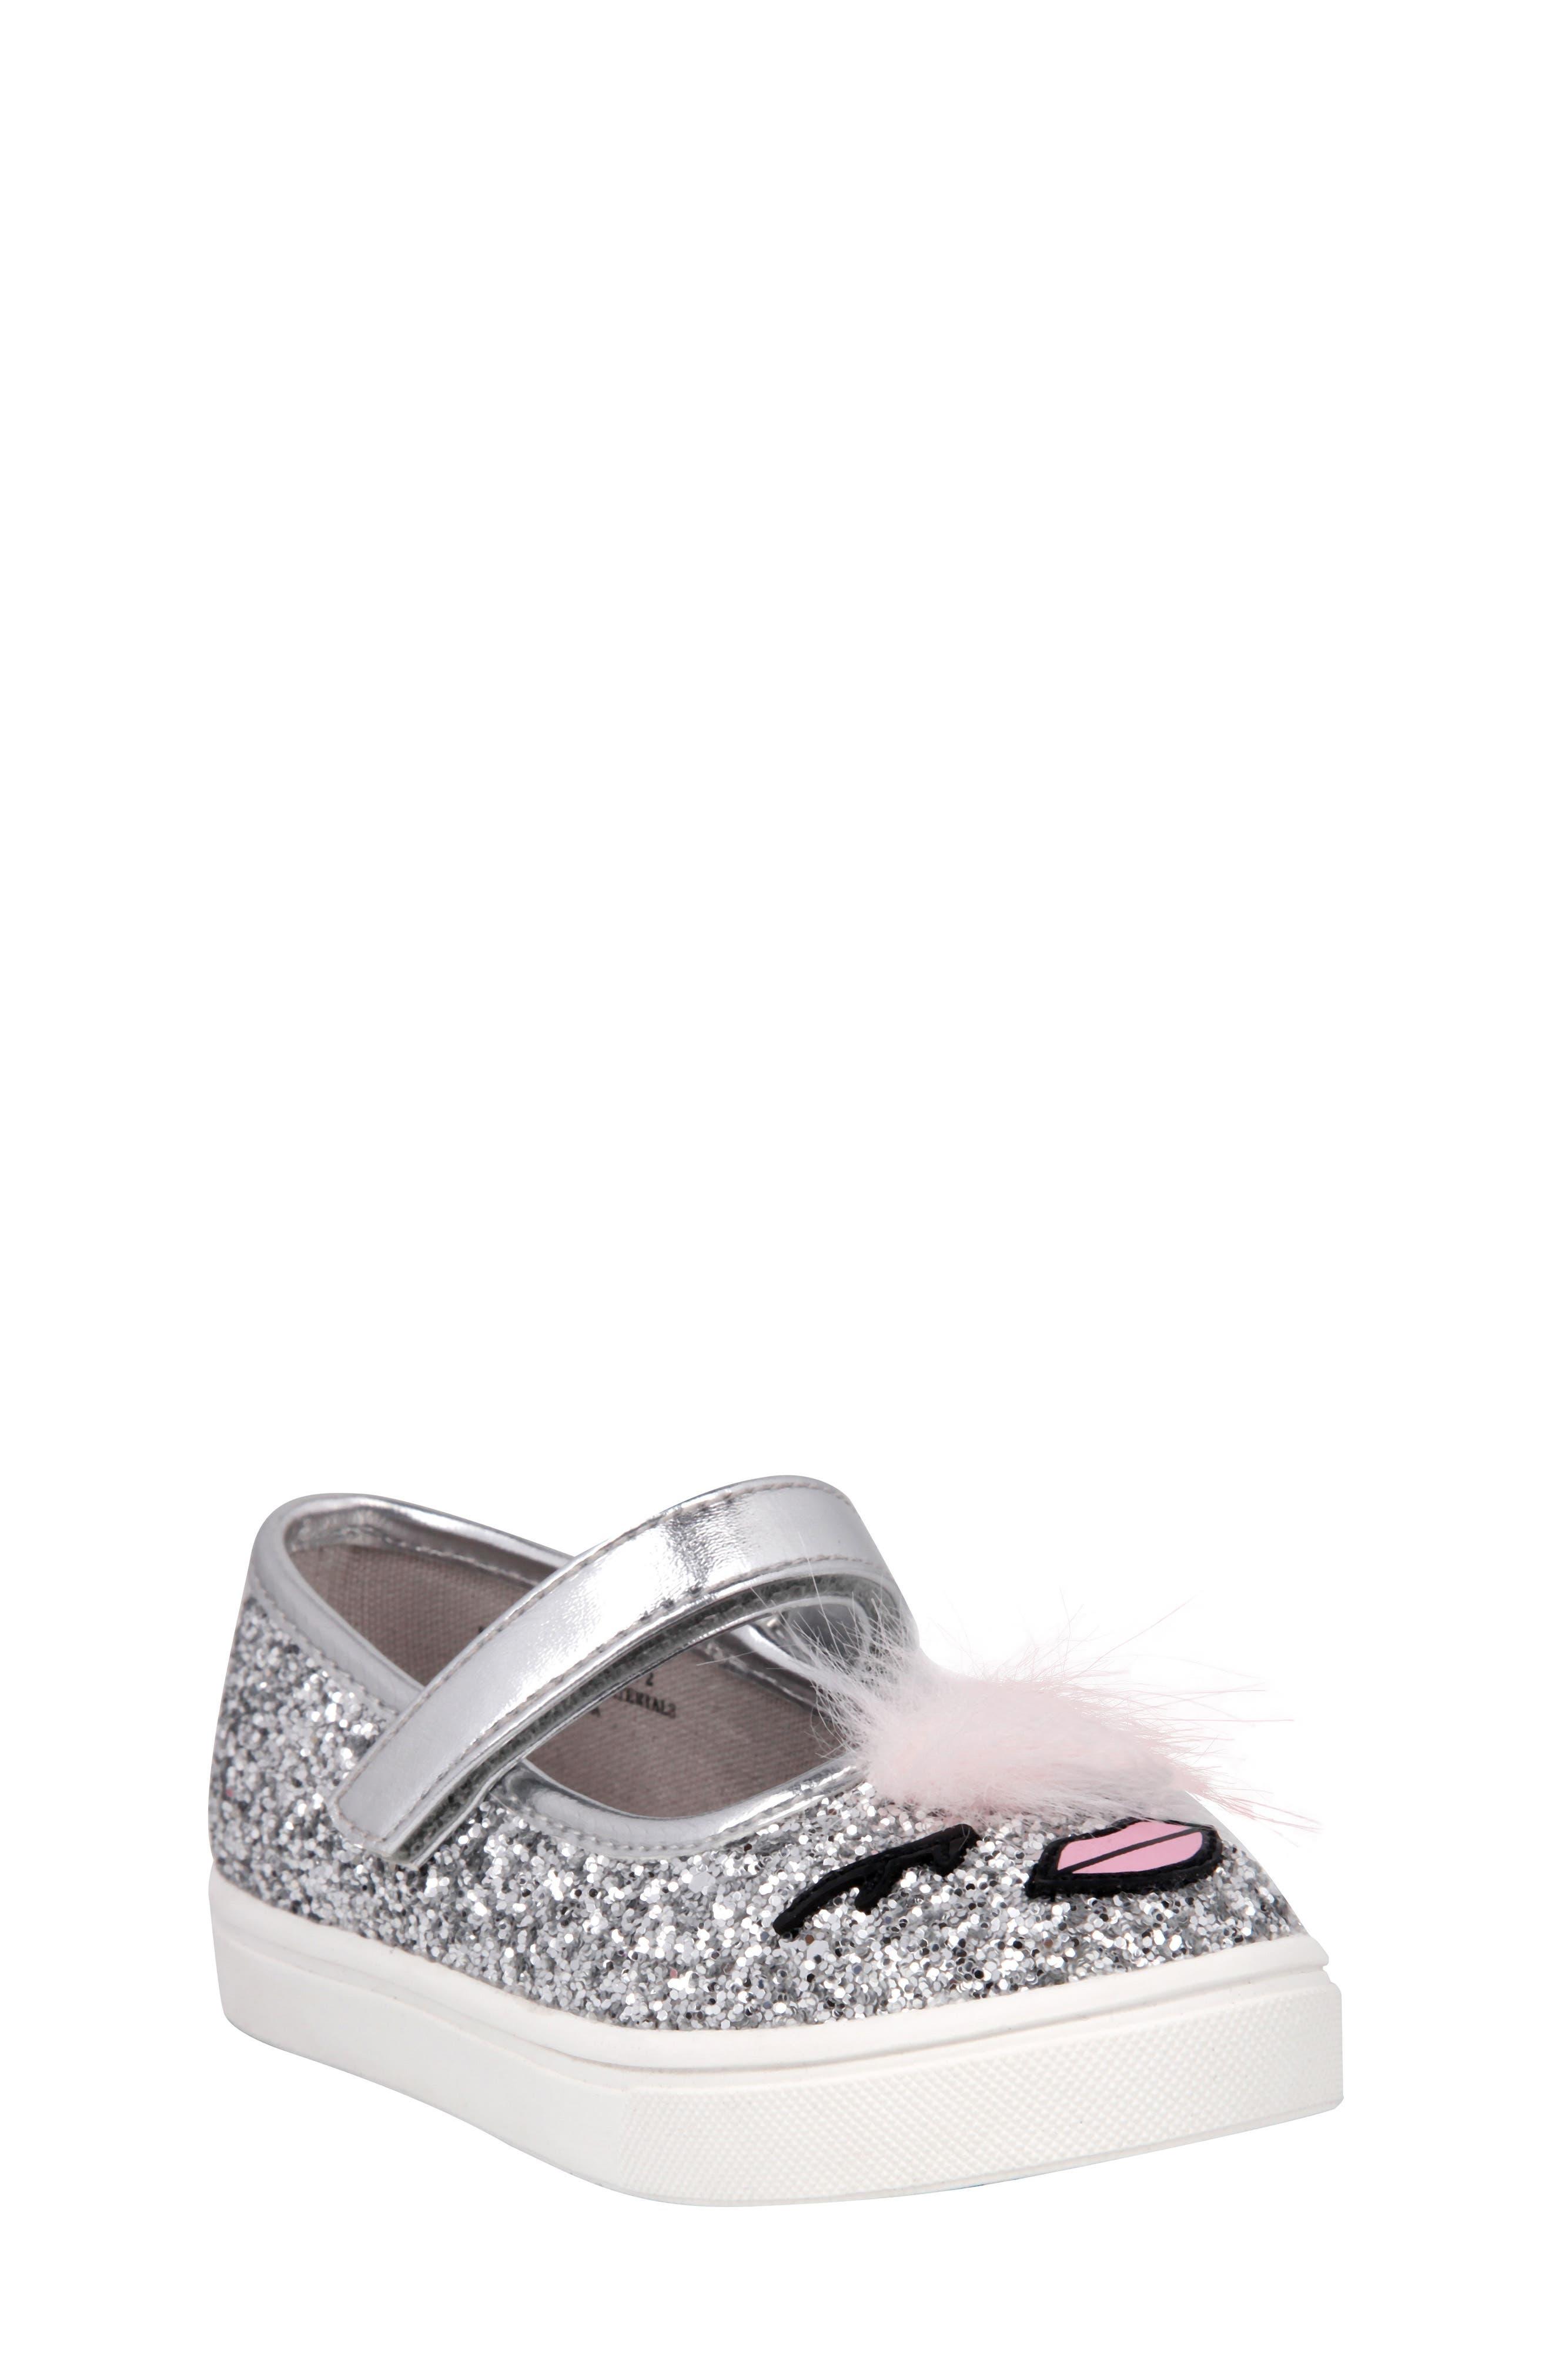 Ragina Faux Fur Glitter Mary Jane Sneaker,                             Main thumbnail 1, color,                             Silver Chunky Glitter